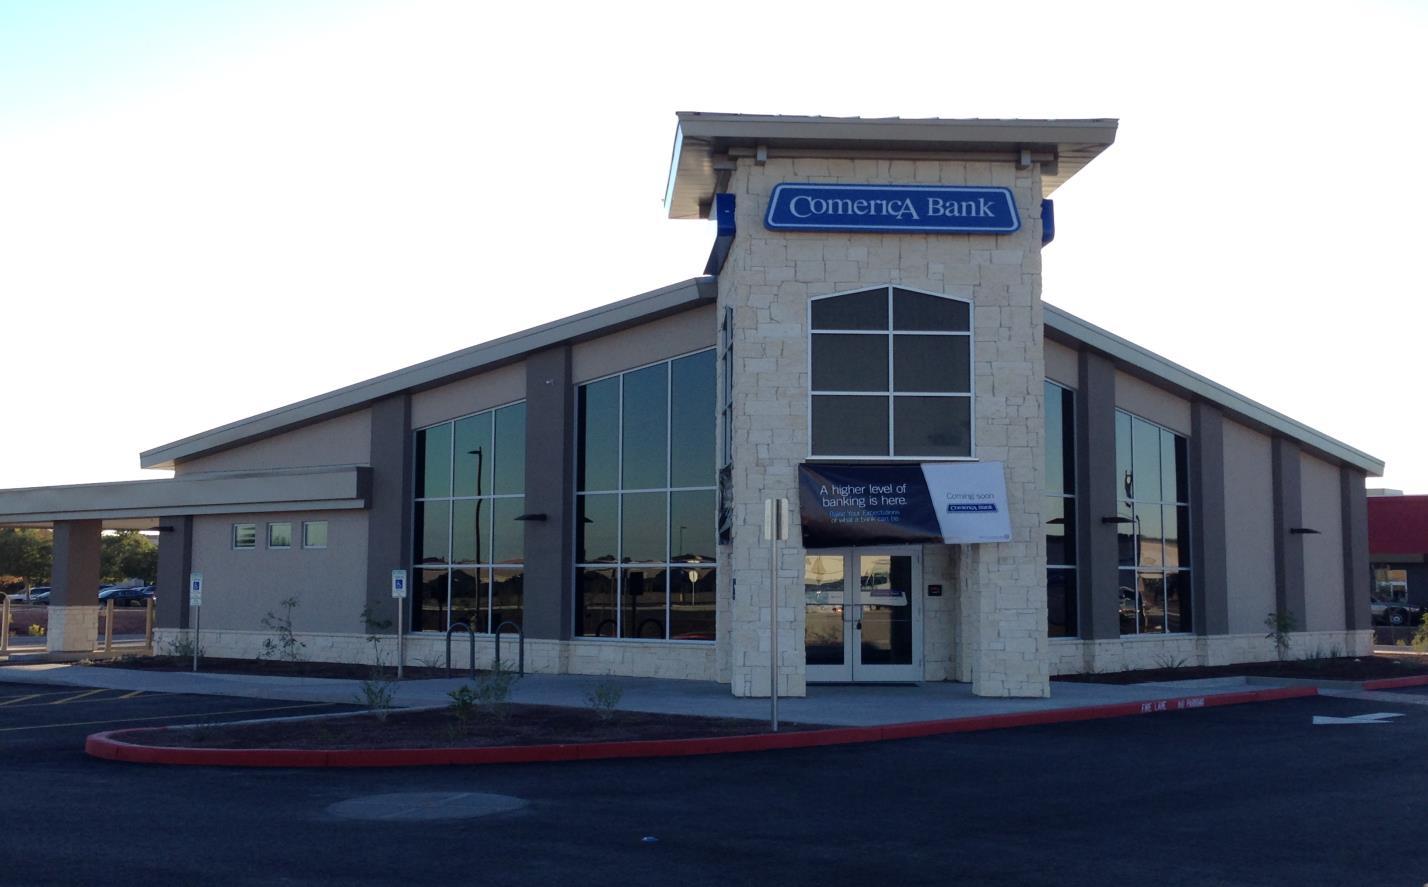 Nail In Tire Repair >> Comerica Bank 7525 W Thunderbird Rd, Peoria, AZ 85381 - YP.com